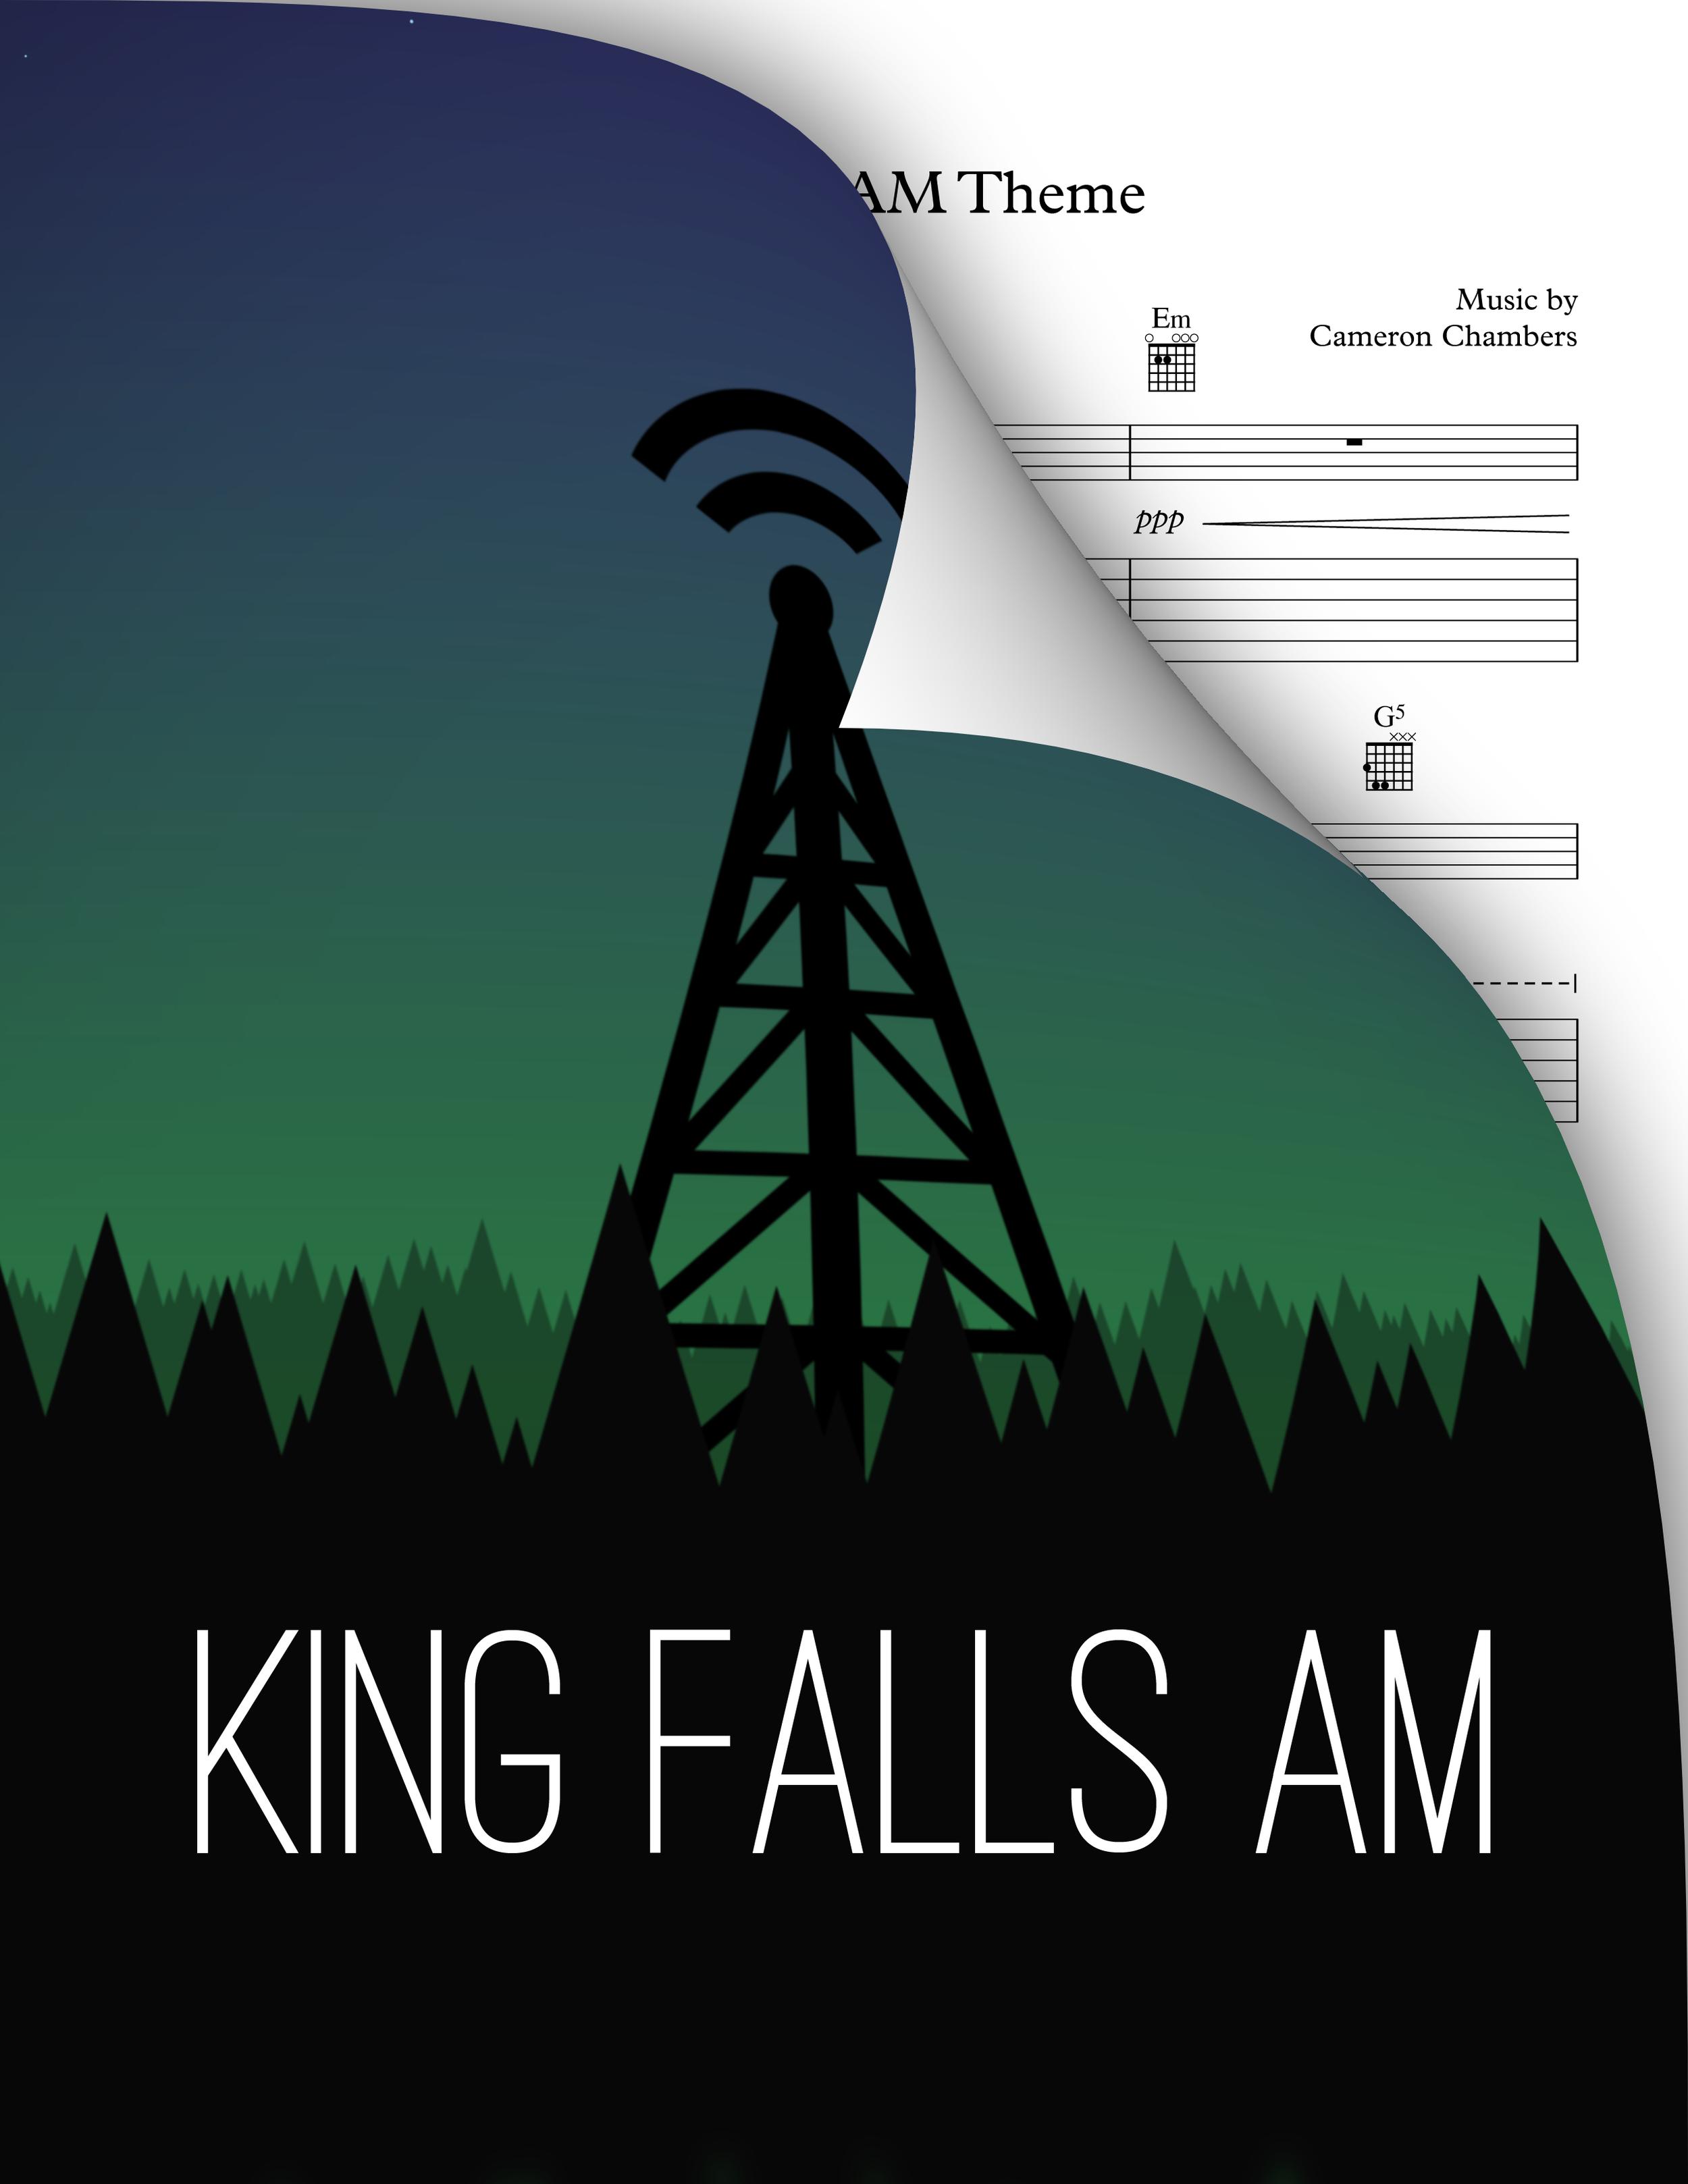 KingFallsAMThemeSheetMusic.png